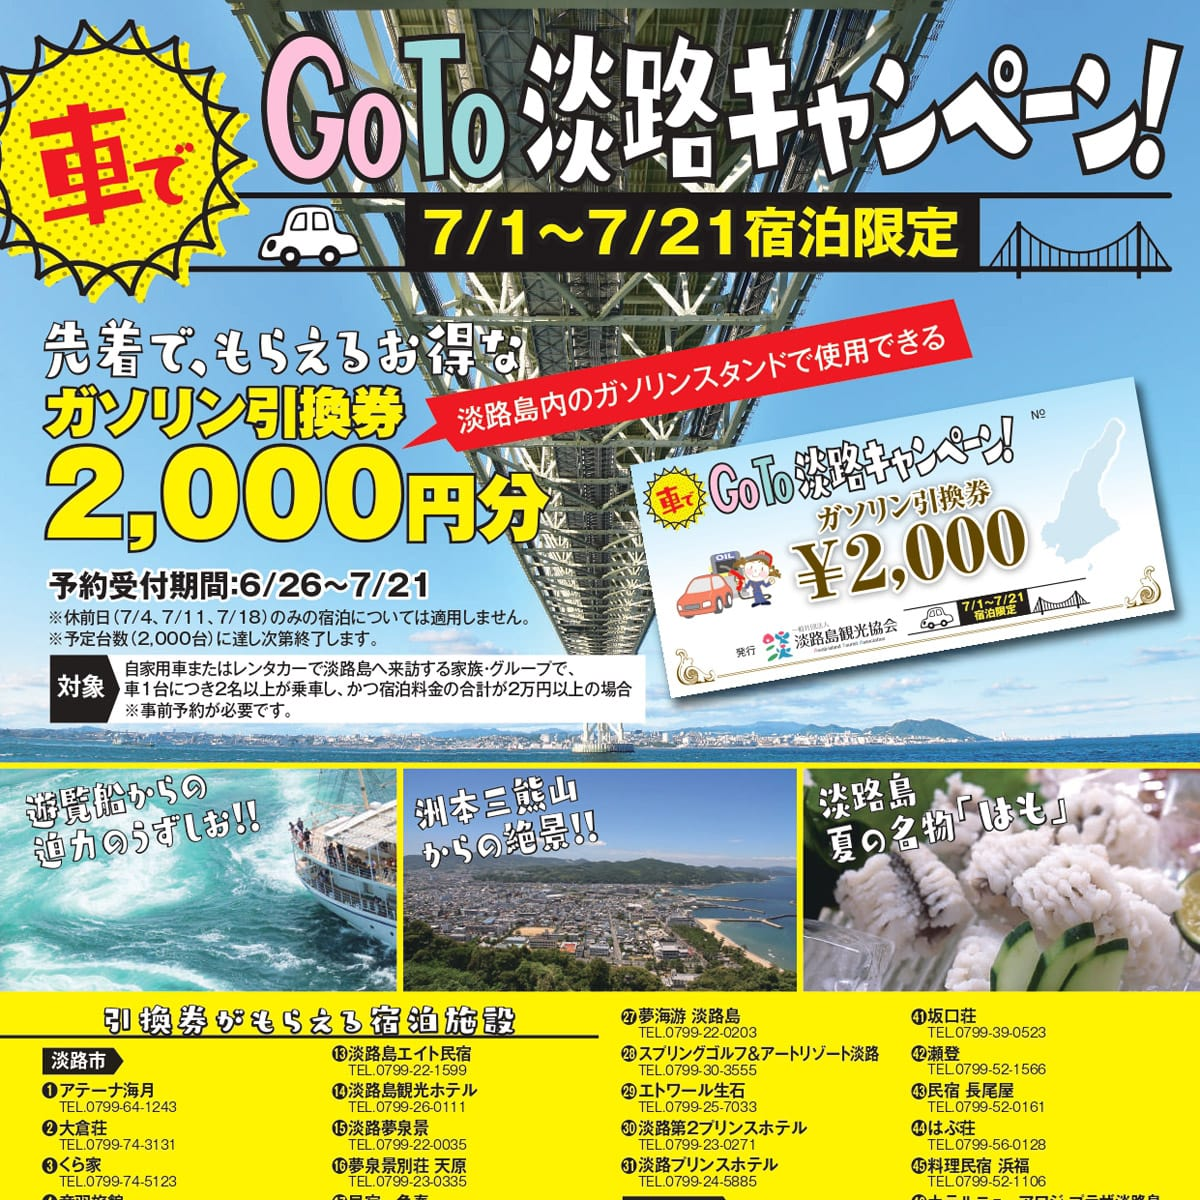 GO TO 淡路キャンペーン